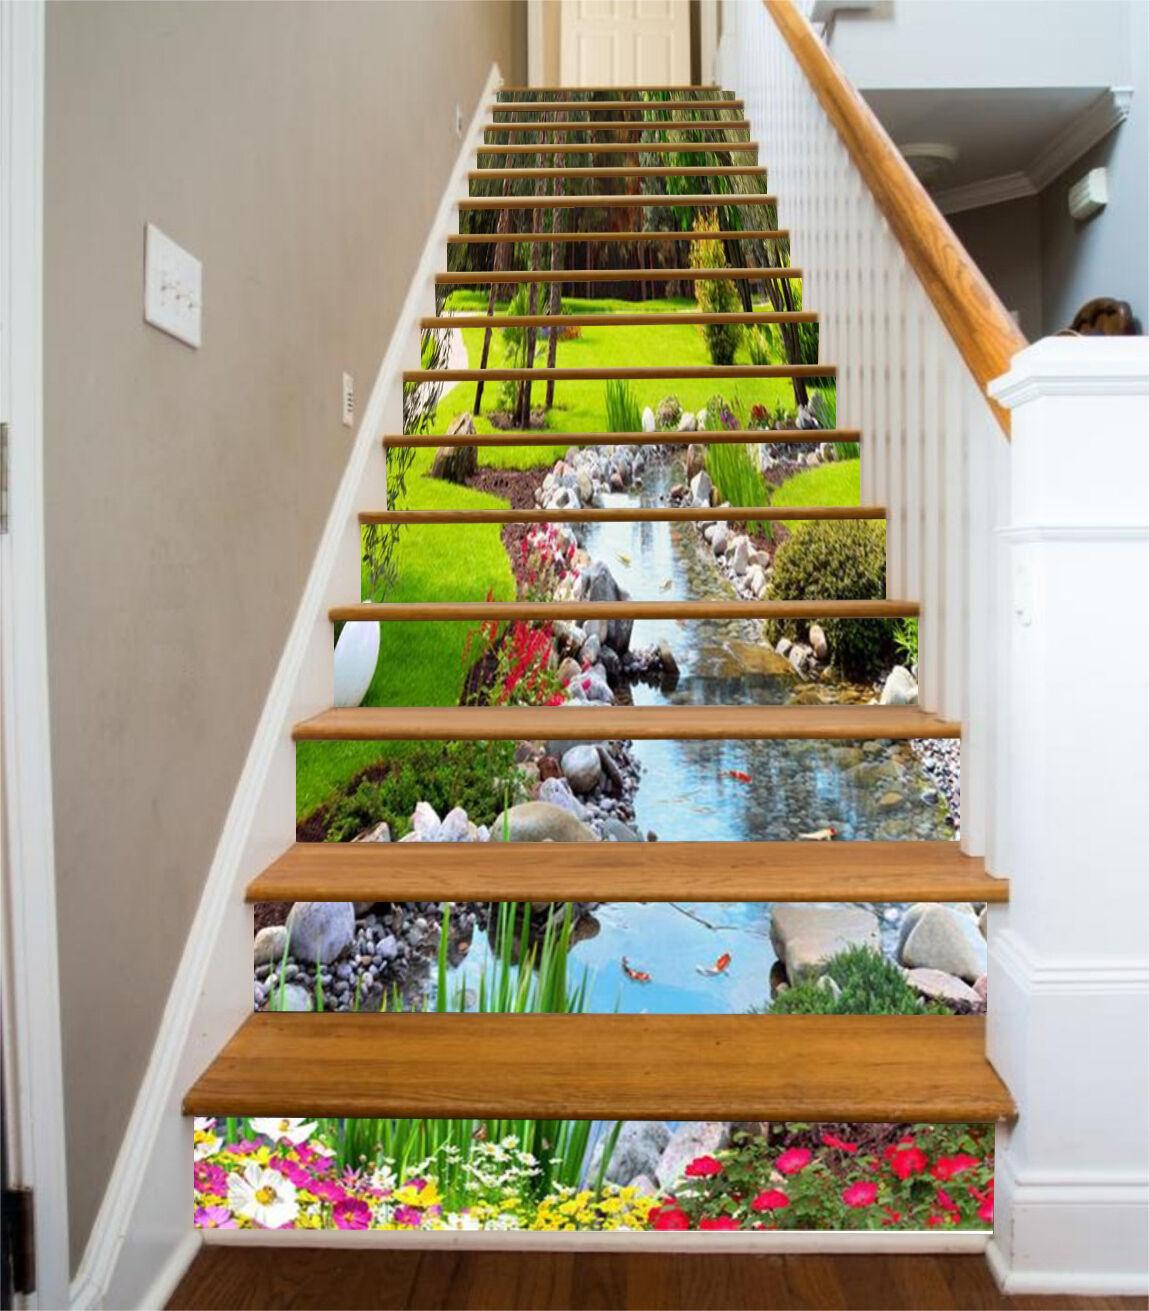 3D Pretty Stream 81 Stair Risers Decoration Photo Mural Vinyl Decal WandPapier UK